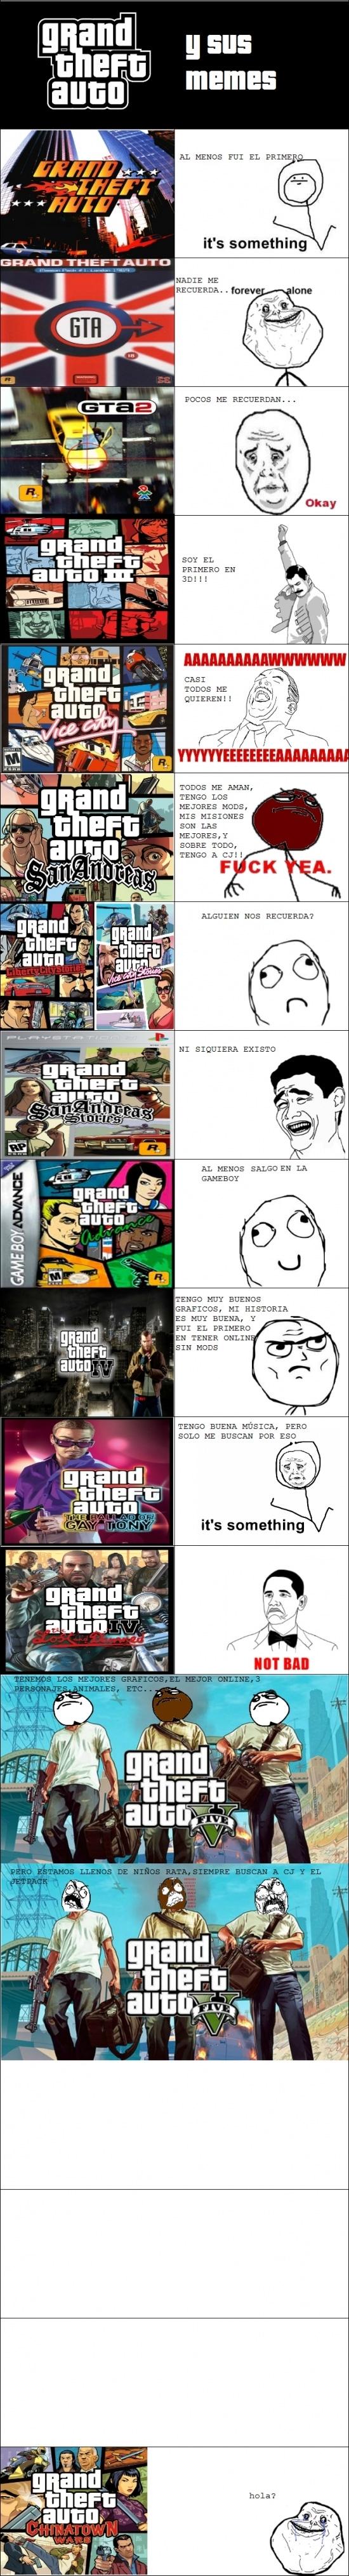 Mix - GTA y sus memes